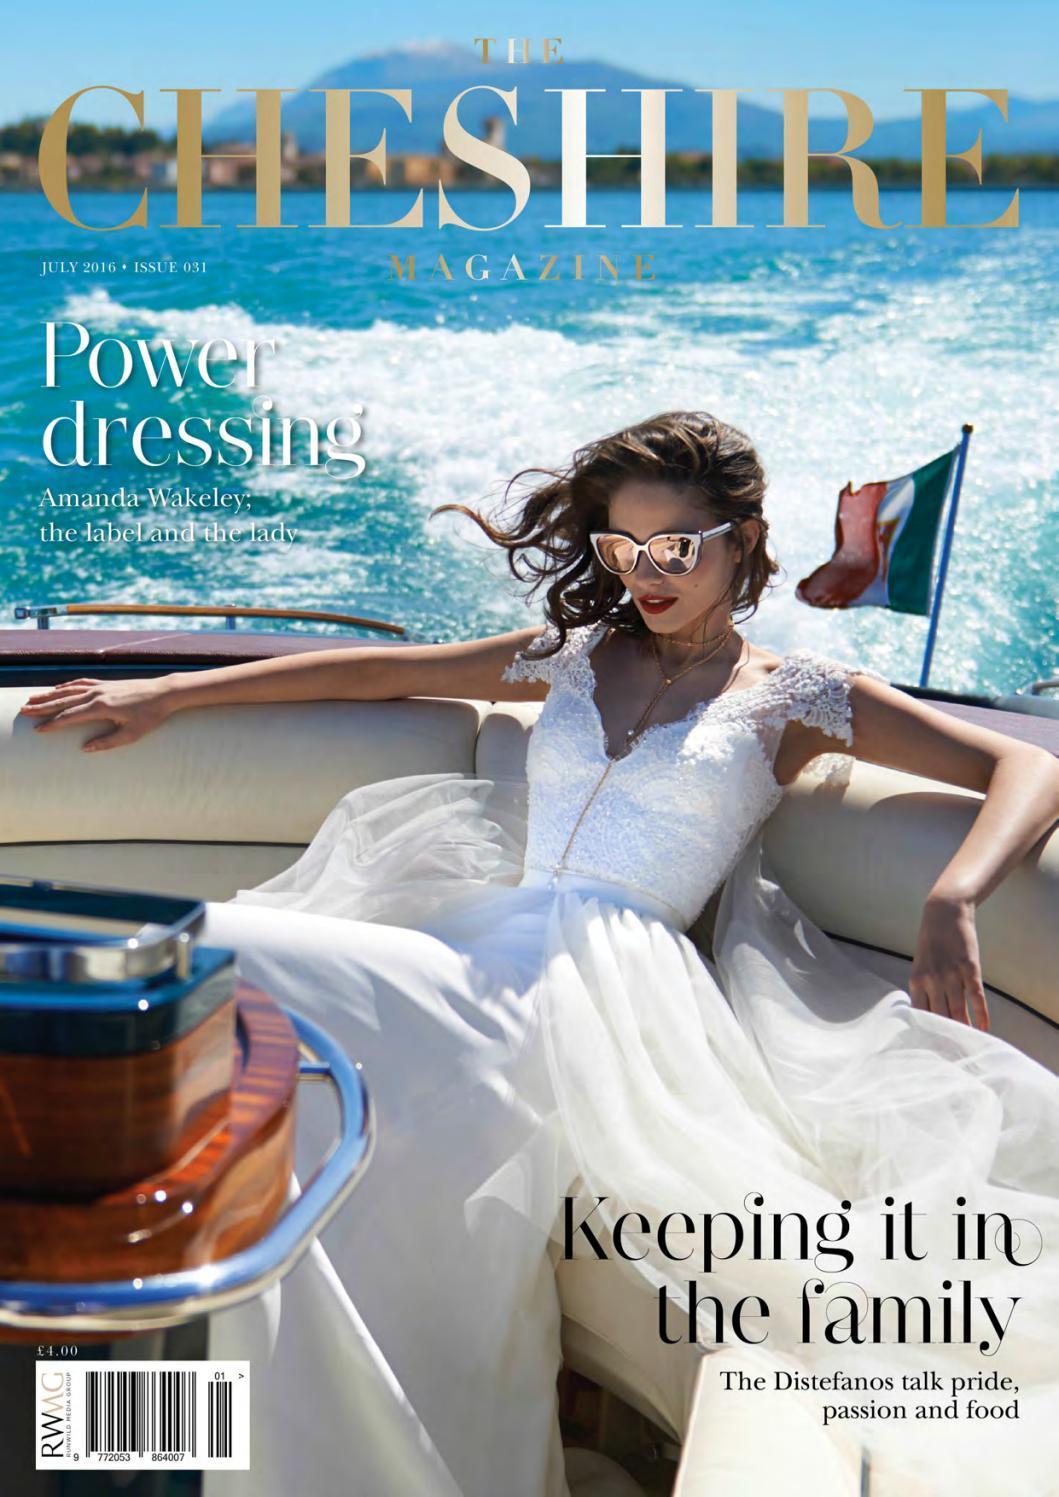 92246505b38 The Cheshire Magazine July 2016 by Runwild Media Group - issuu